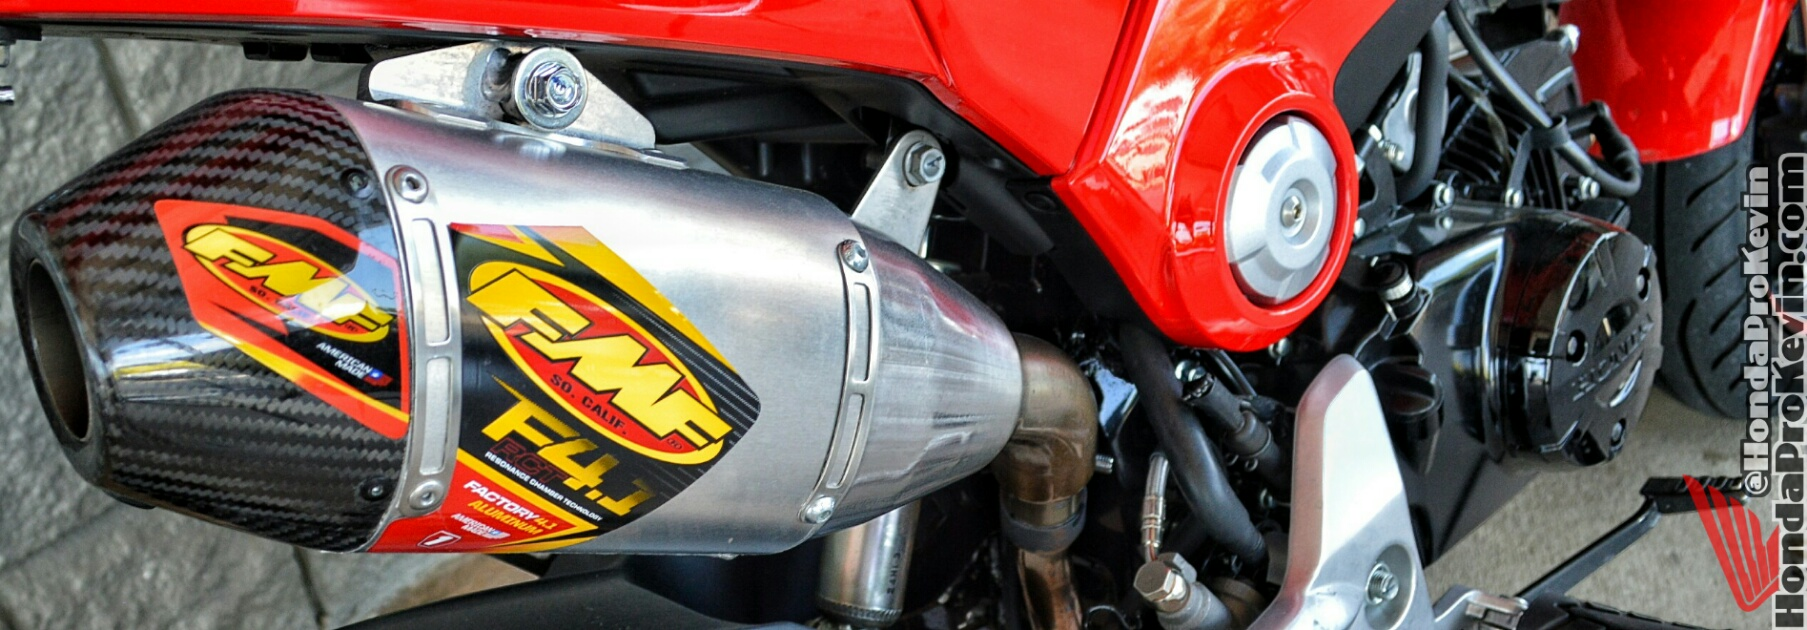 Custom Honda Grom / MSX 125 FMF Exhaust - Carbon Fiber Muffler - Motorcycle / Bike Aftermarket Parts